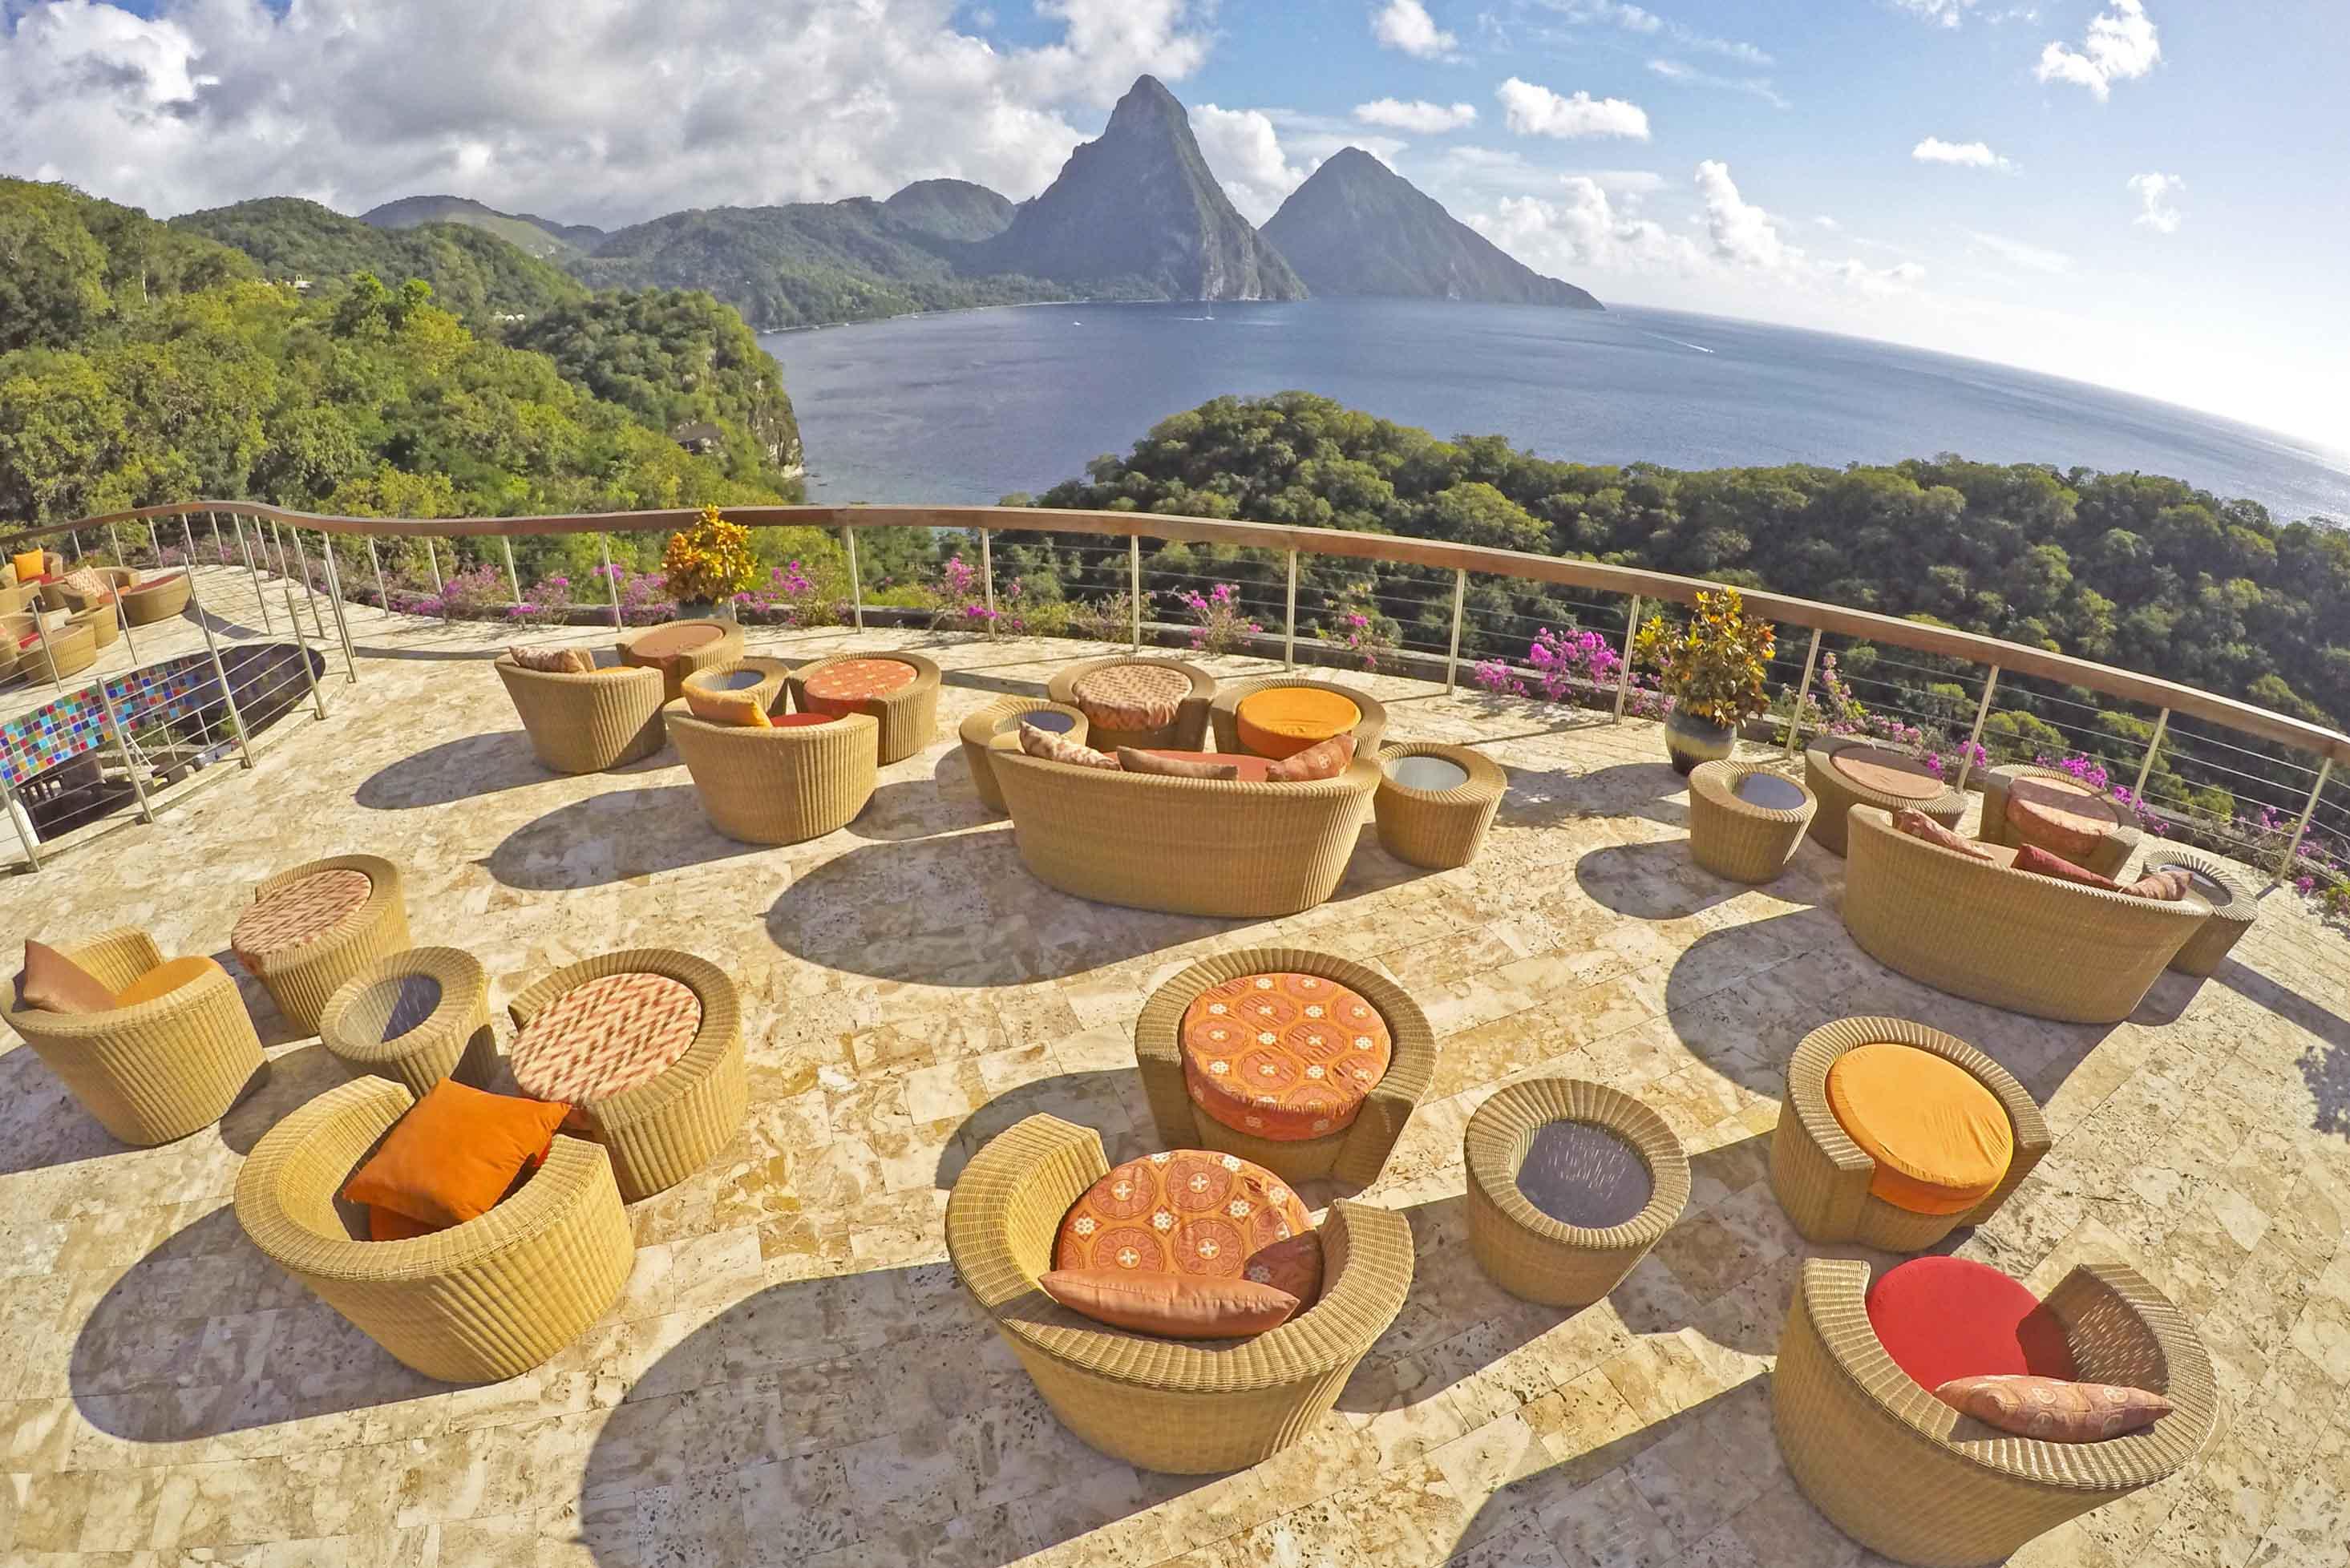 Celestial Terrace do hotel Jade Mountain | foto: Lala Rebelo